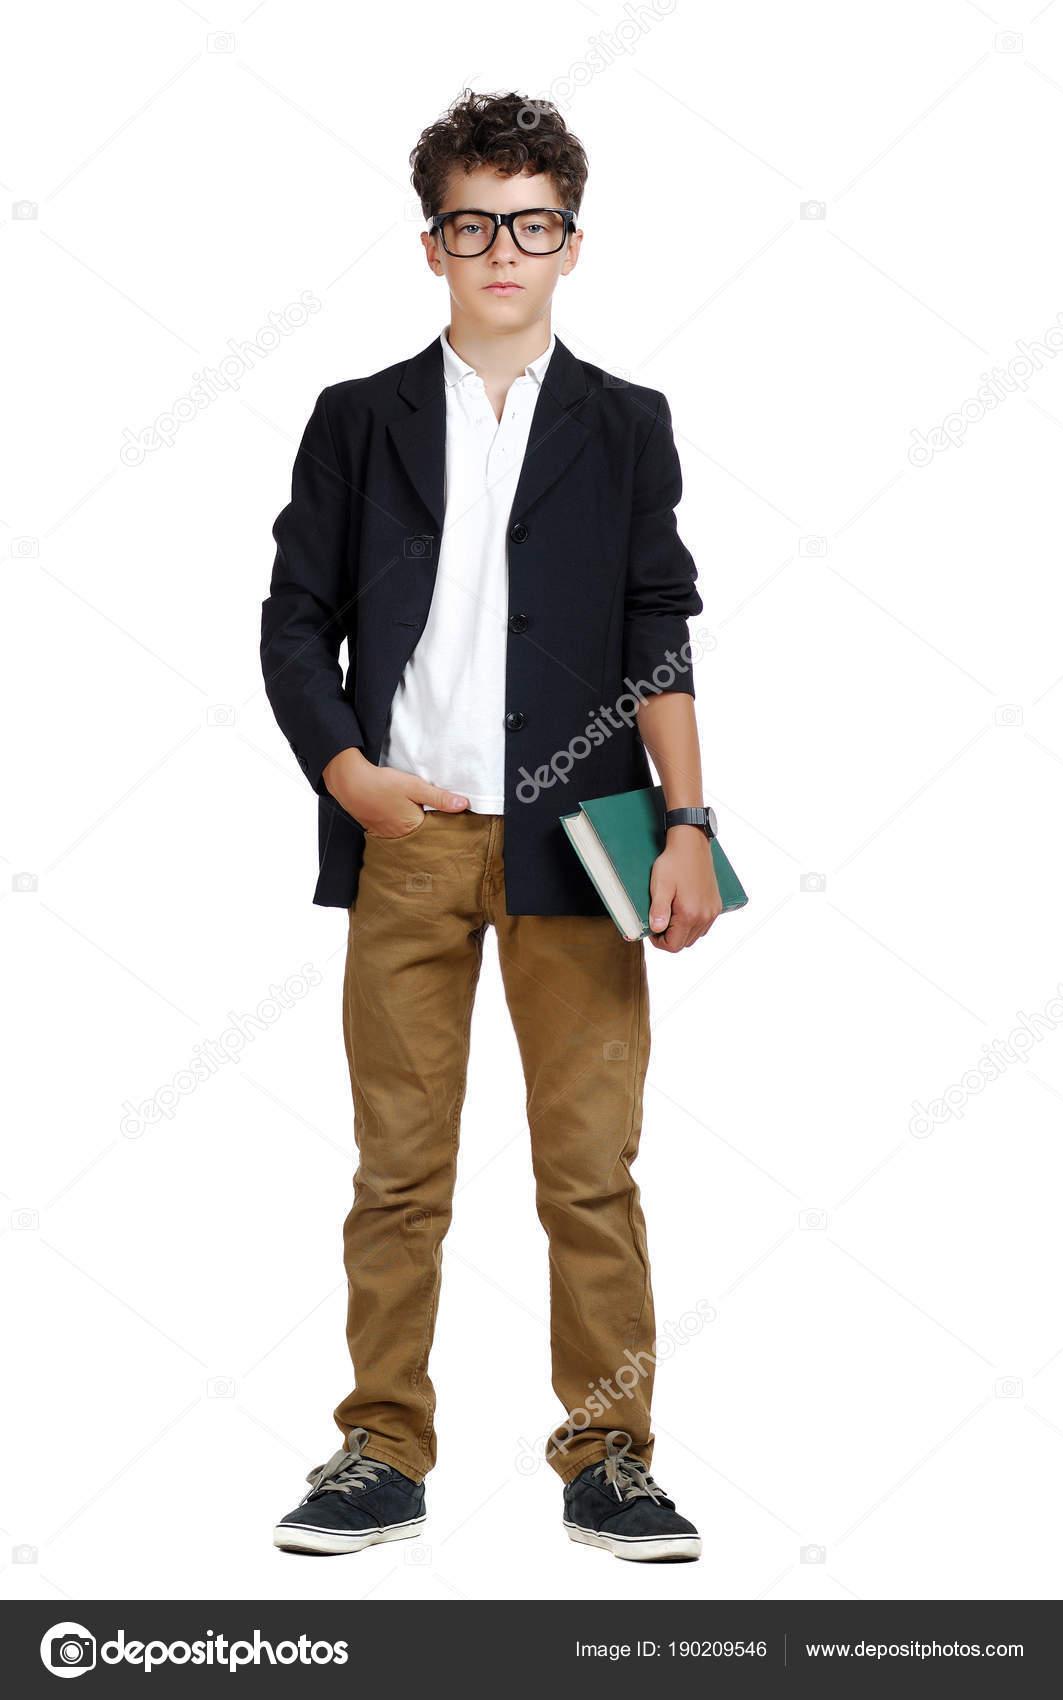 d3165448646e Μπροστινή Άποψη Εικόνα Του Ένα Αγόρι Που Φοράει Επίσημα Ρούχα — Φωτογραφία  Αρχείου